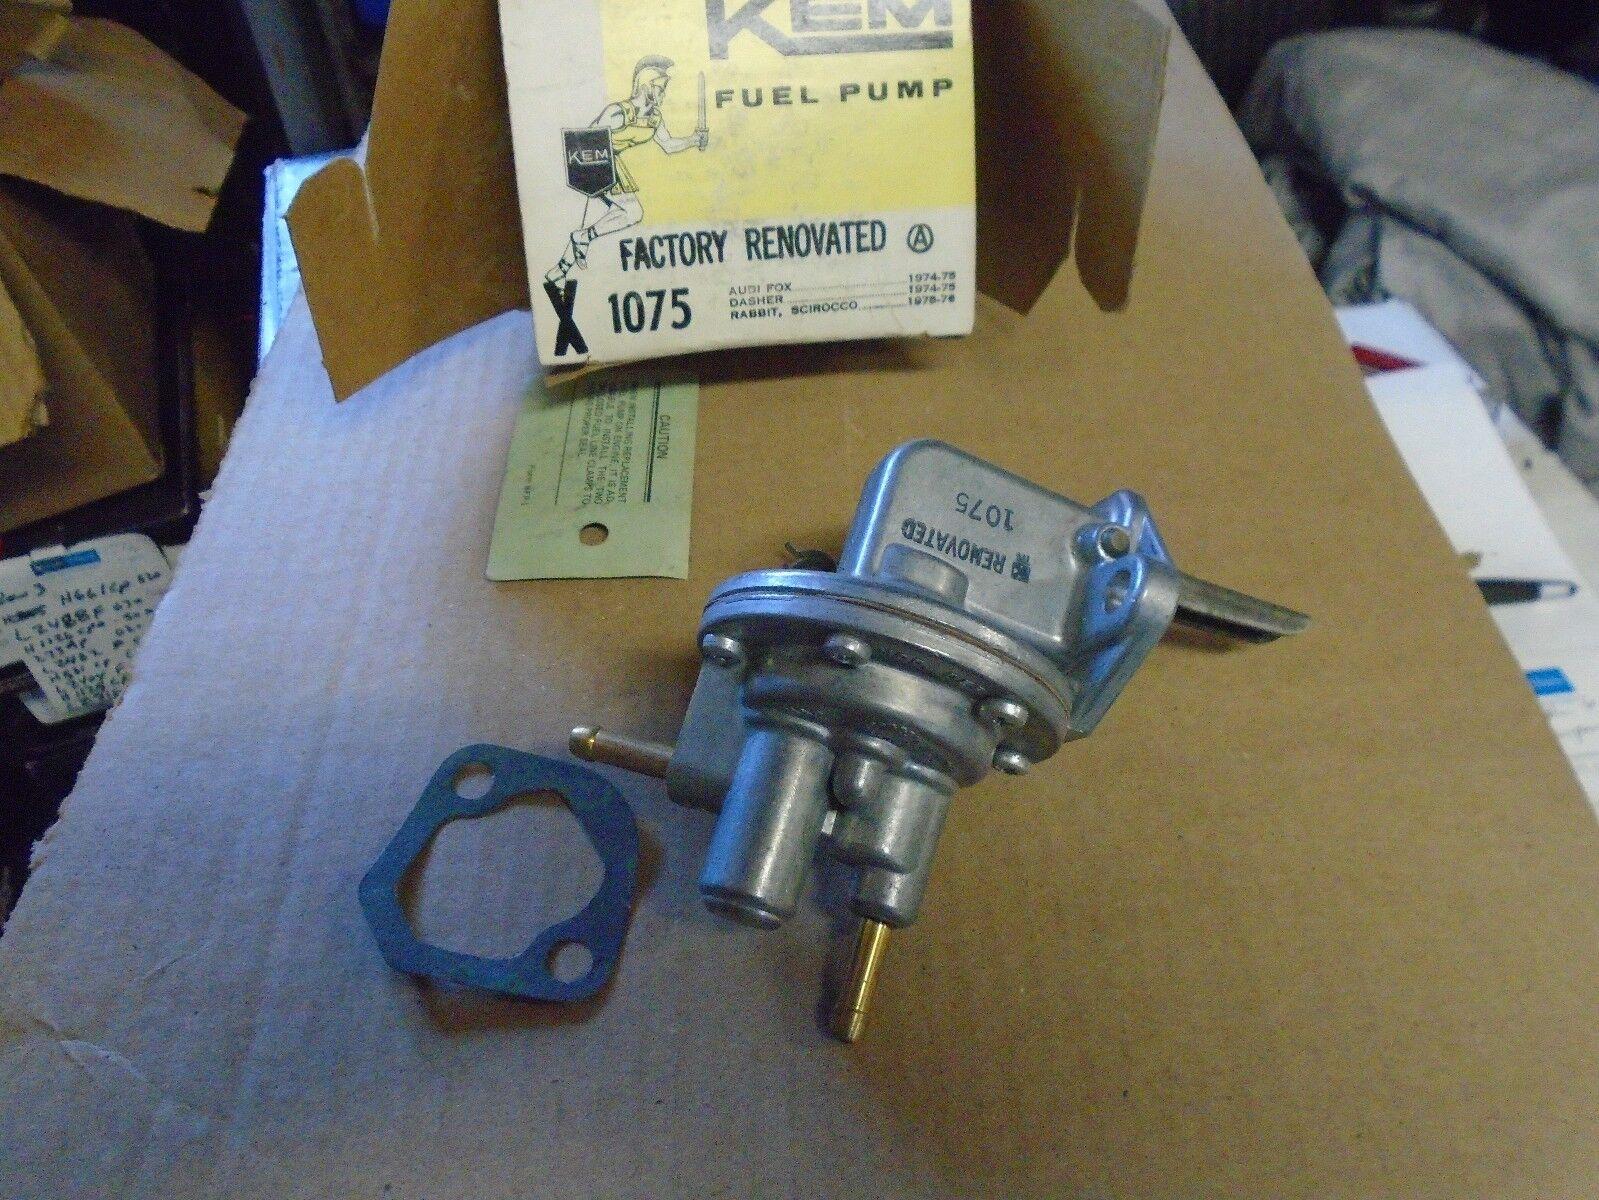 Used Volkswagen Fuel Pumps For Sale Tiguan Filter 1974 1976 Audi Fox Kem Factory Rebuilt Mechanical Pump 1075